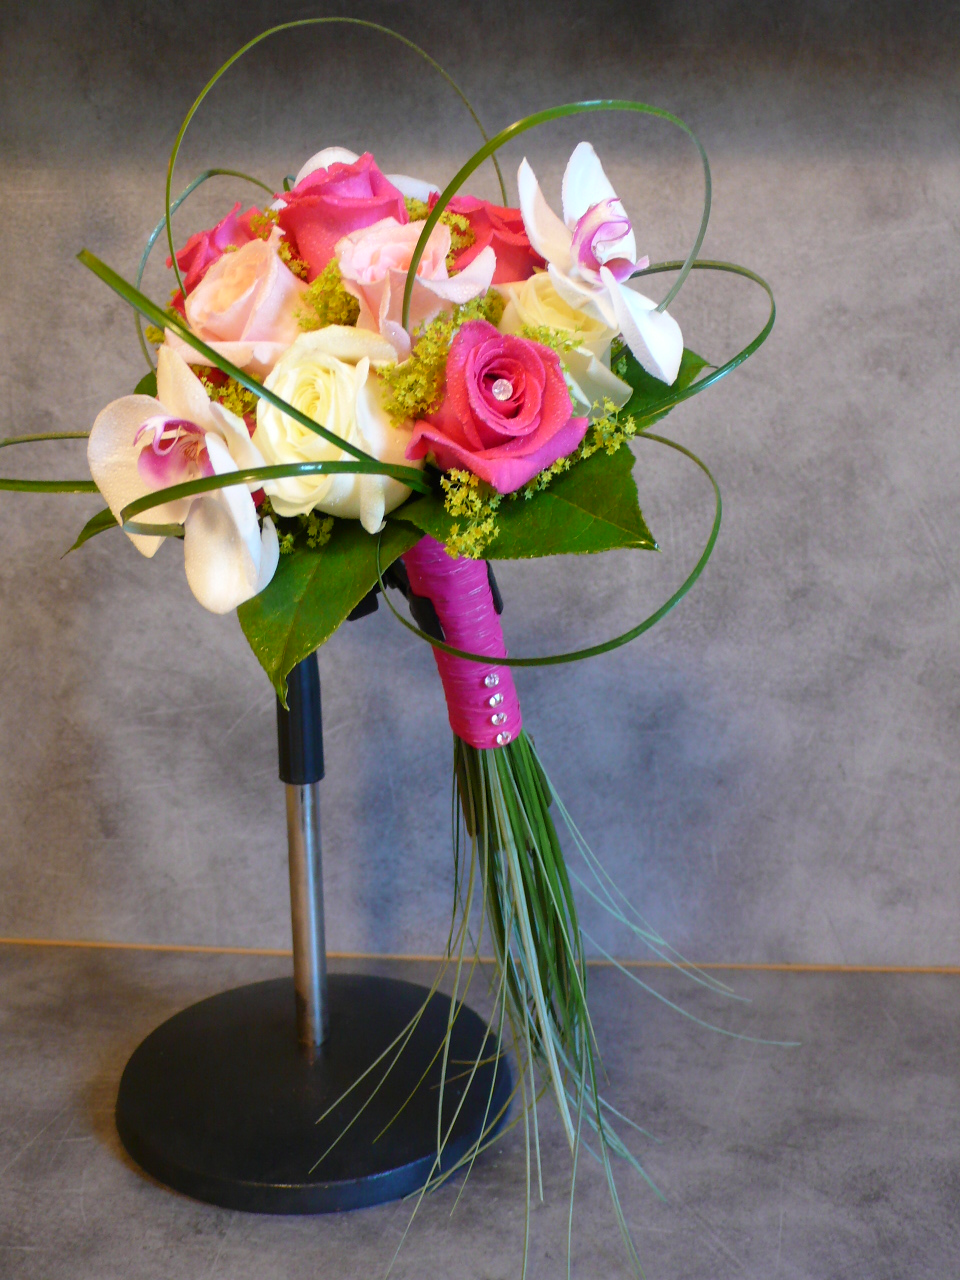 bouquet mari e roses orchid e baergrass fleurs mariage. Black Bedroom Furniture Sets. Home Design Ideas